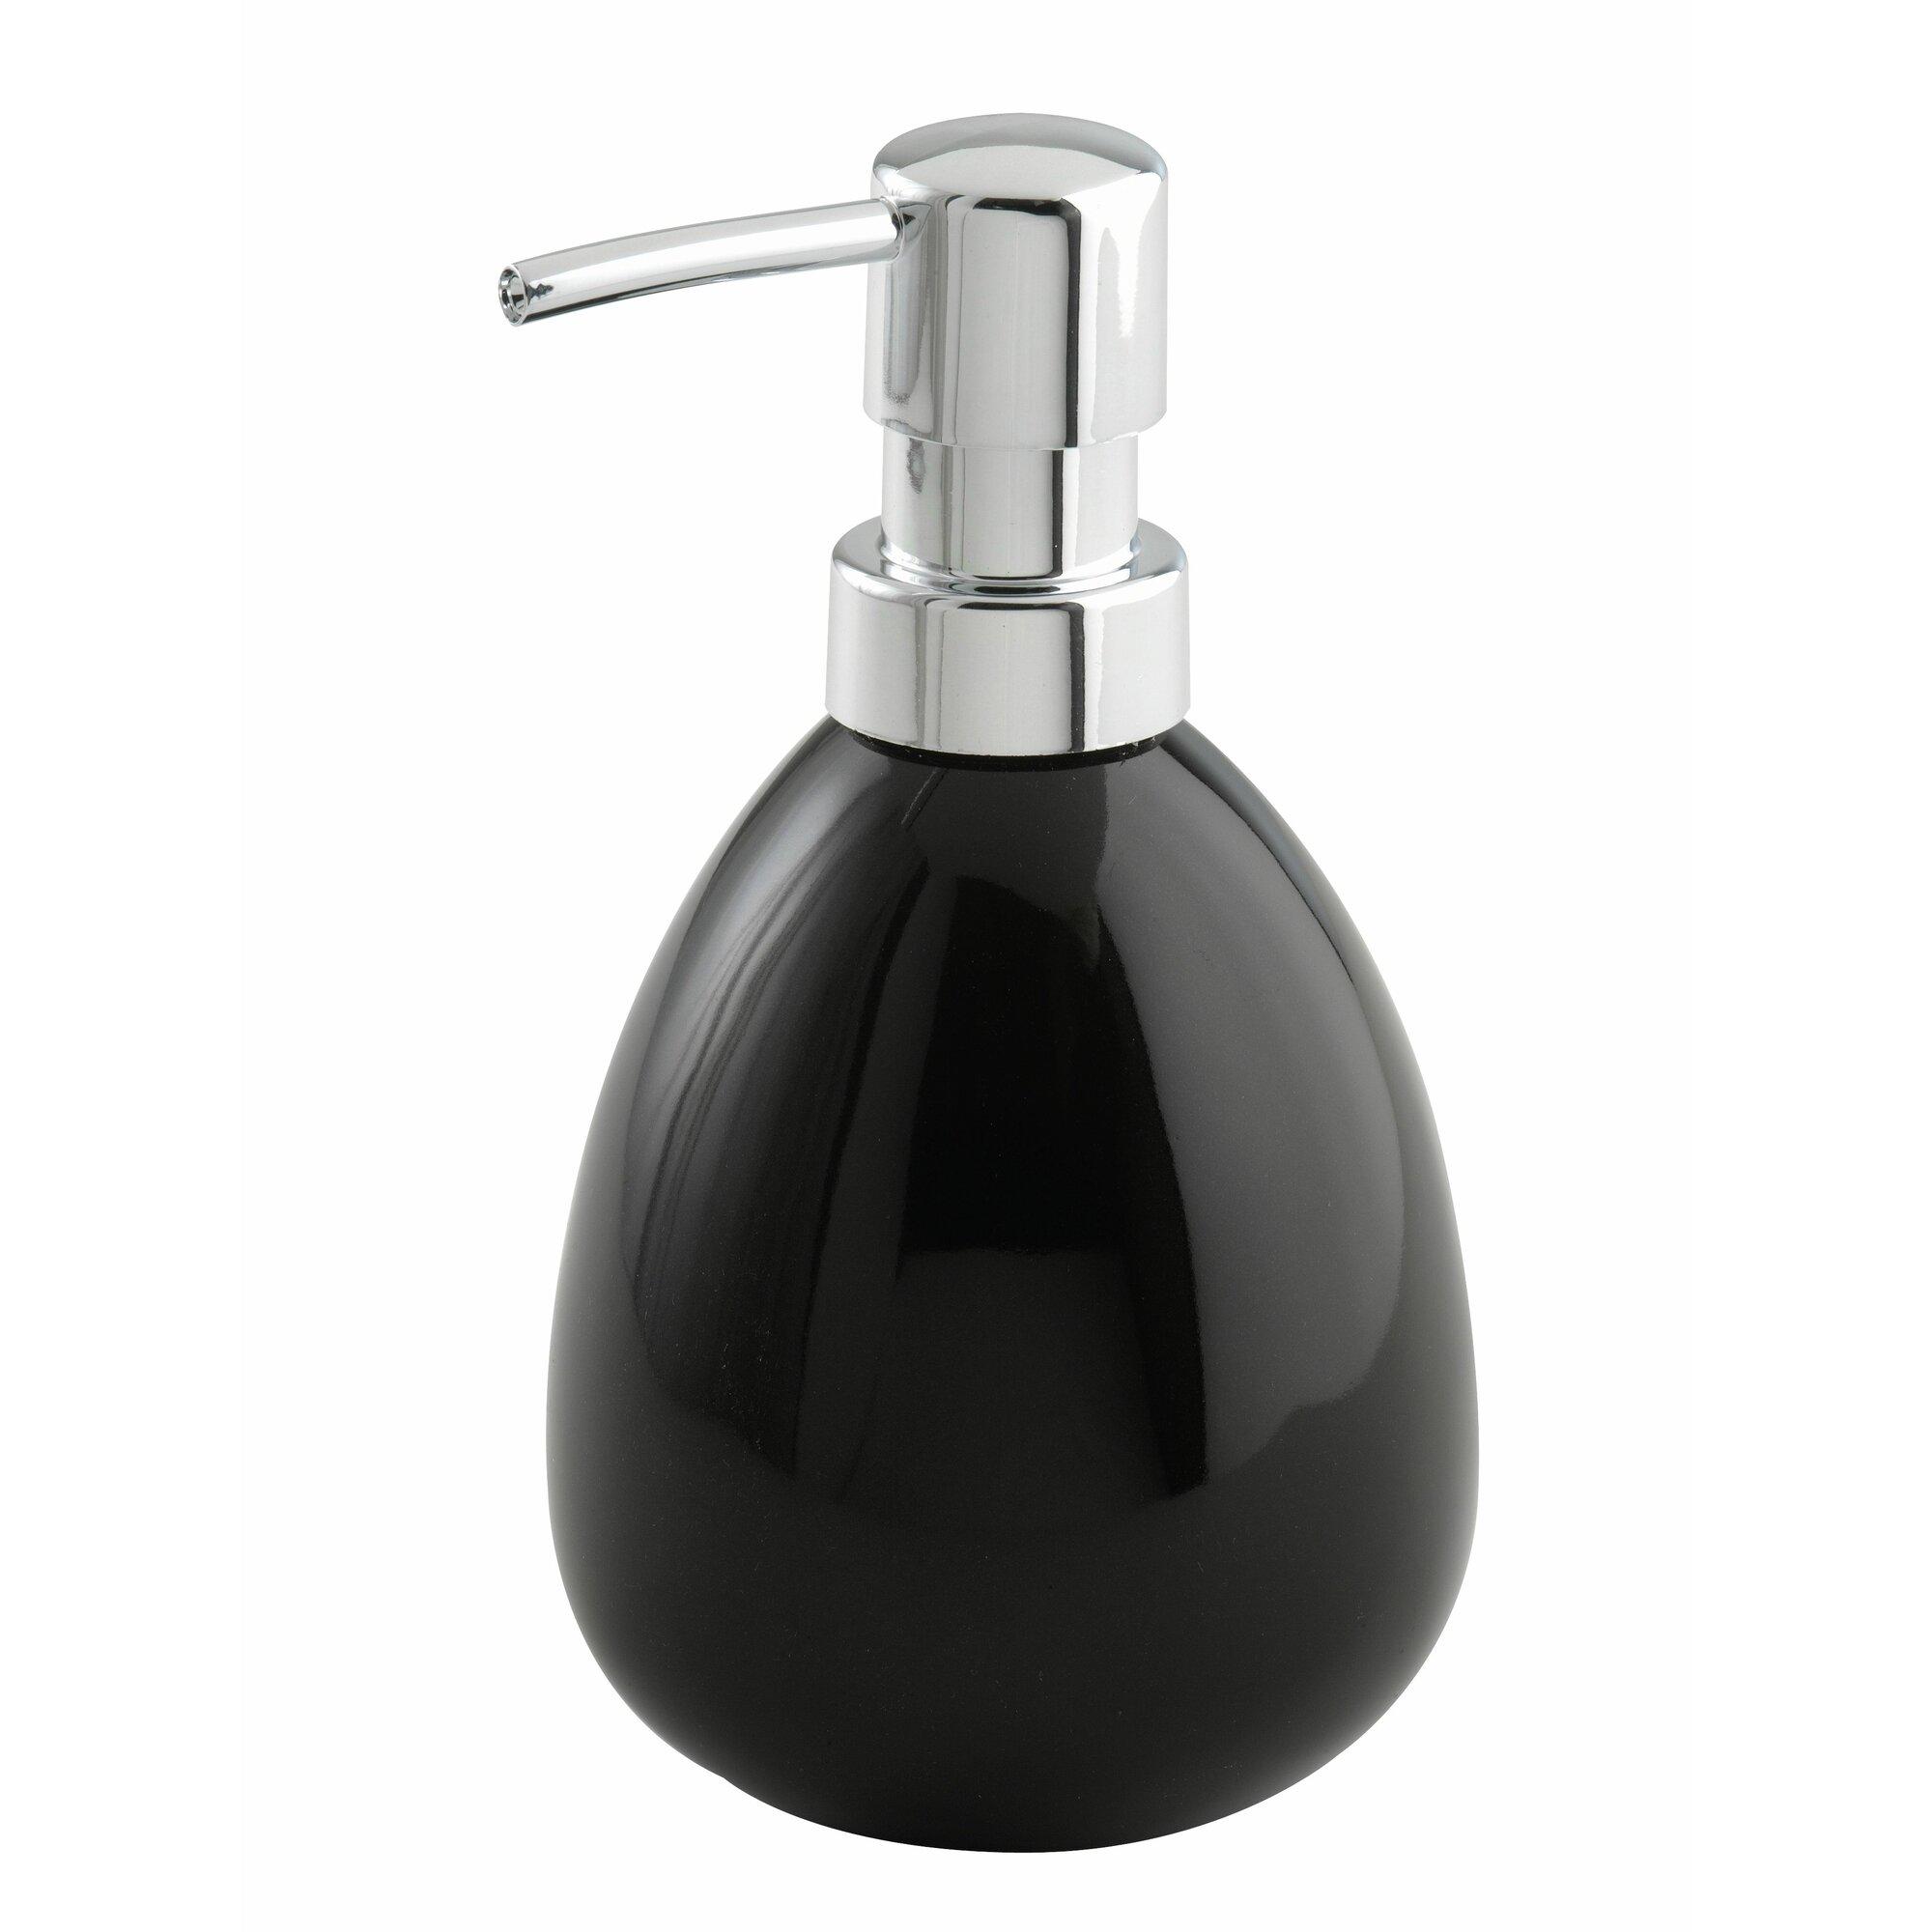 wenko polaris 3 piece bathroom accessory set reviews. Black Bedroom Furniture Sets. Home Design Ideas